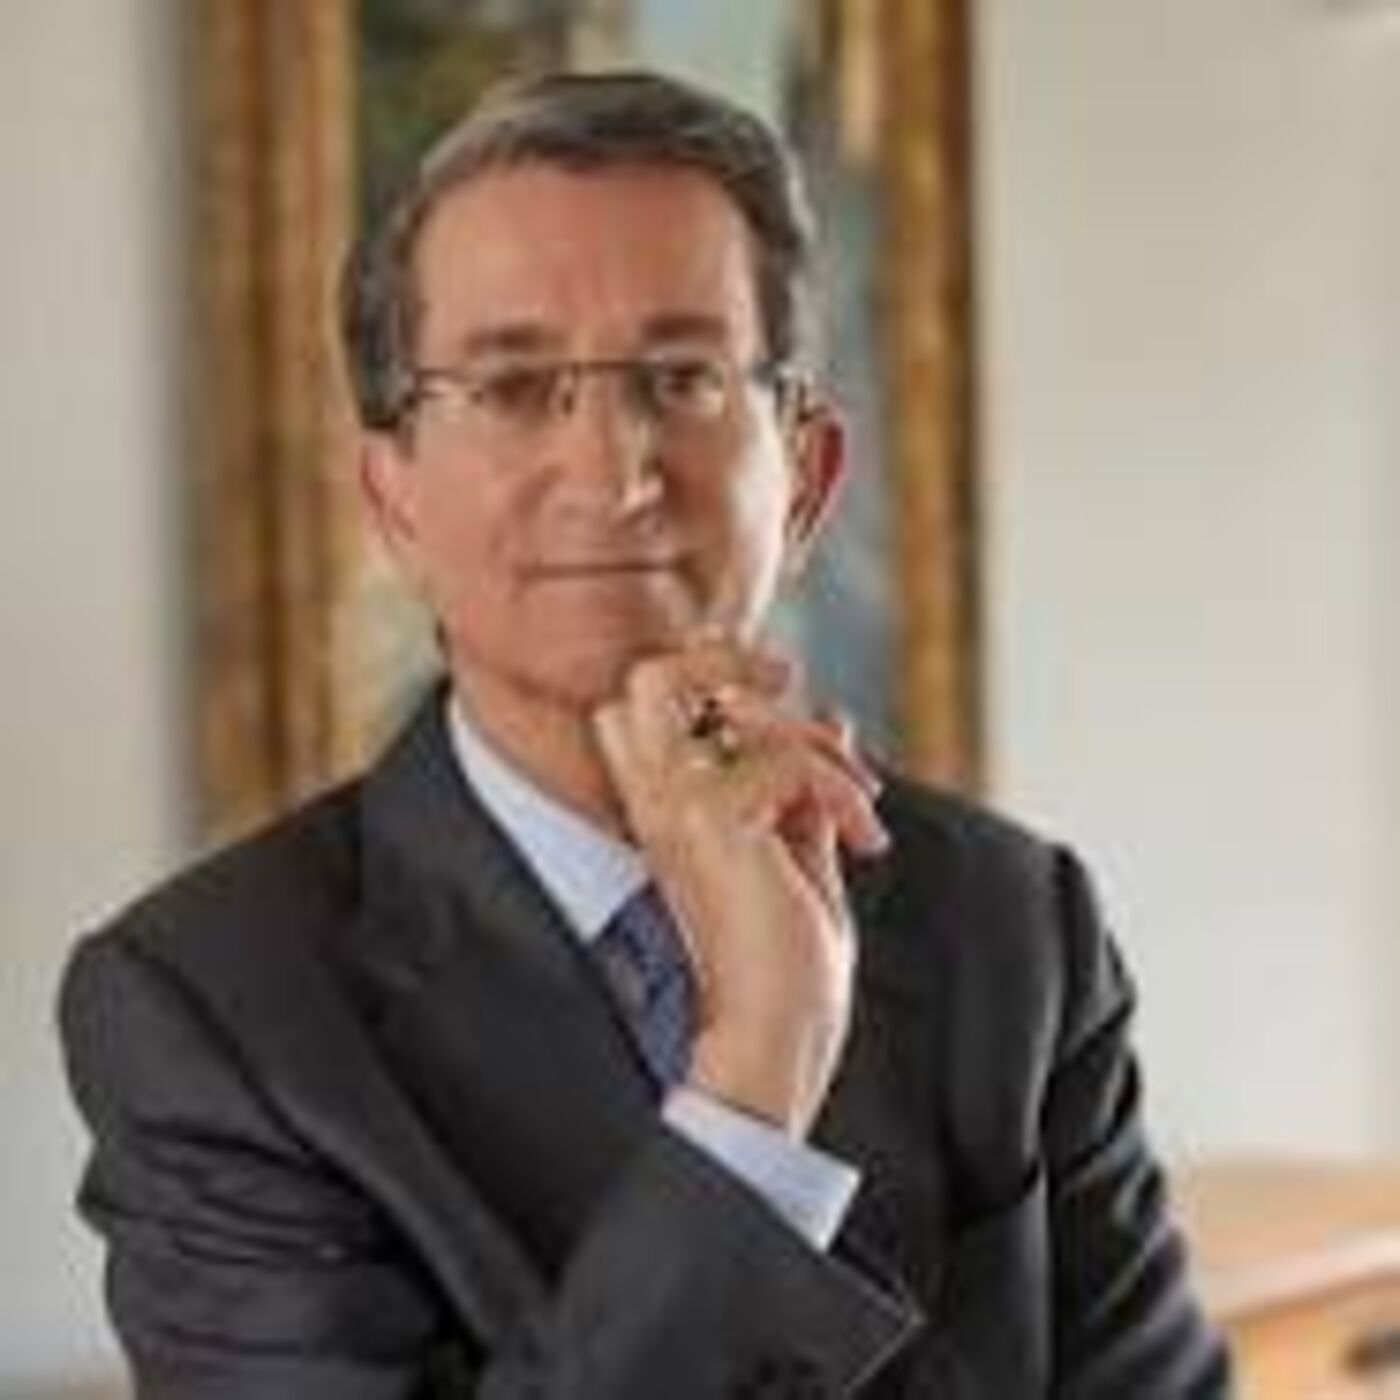 Former Tivity Health/Nutrisystem CEO – Donato Tramuto